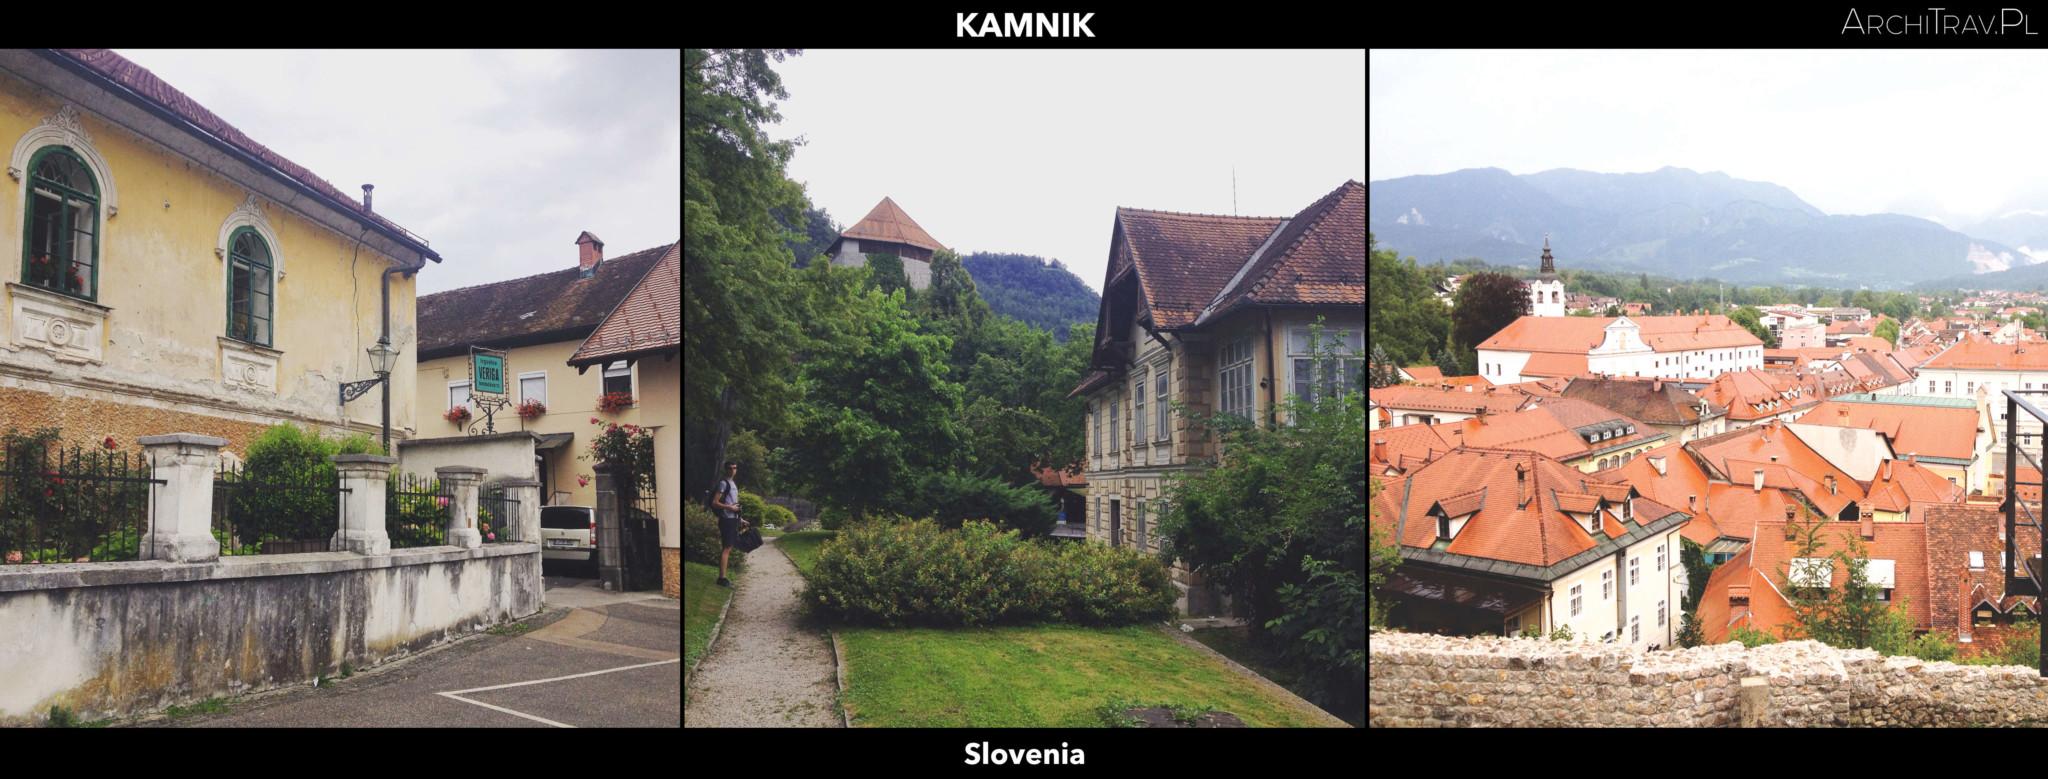 Slowenia Kamnik